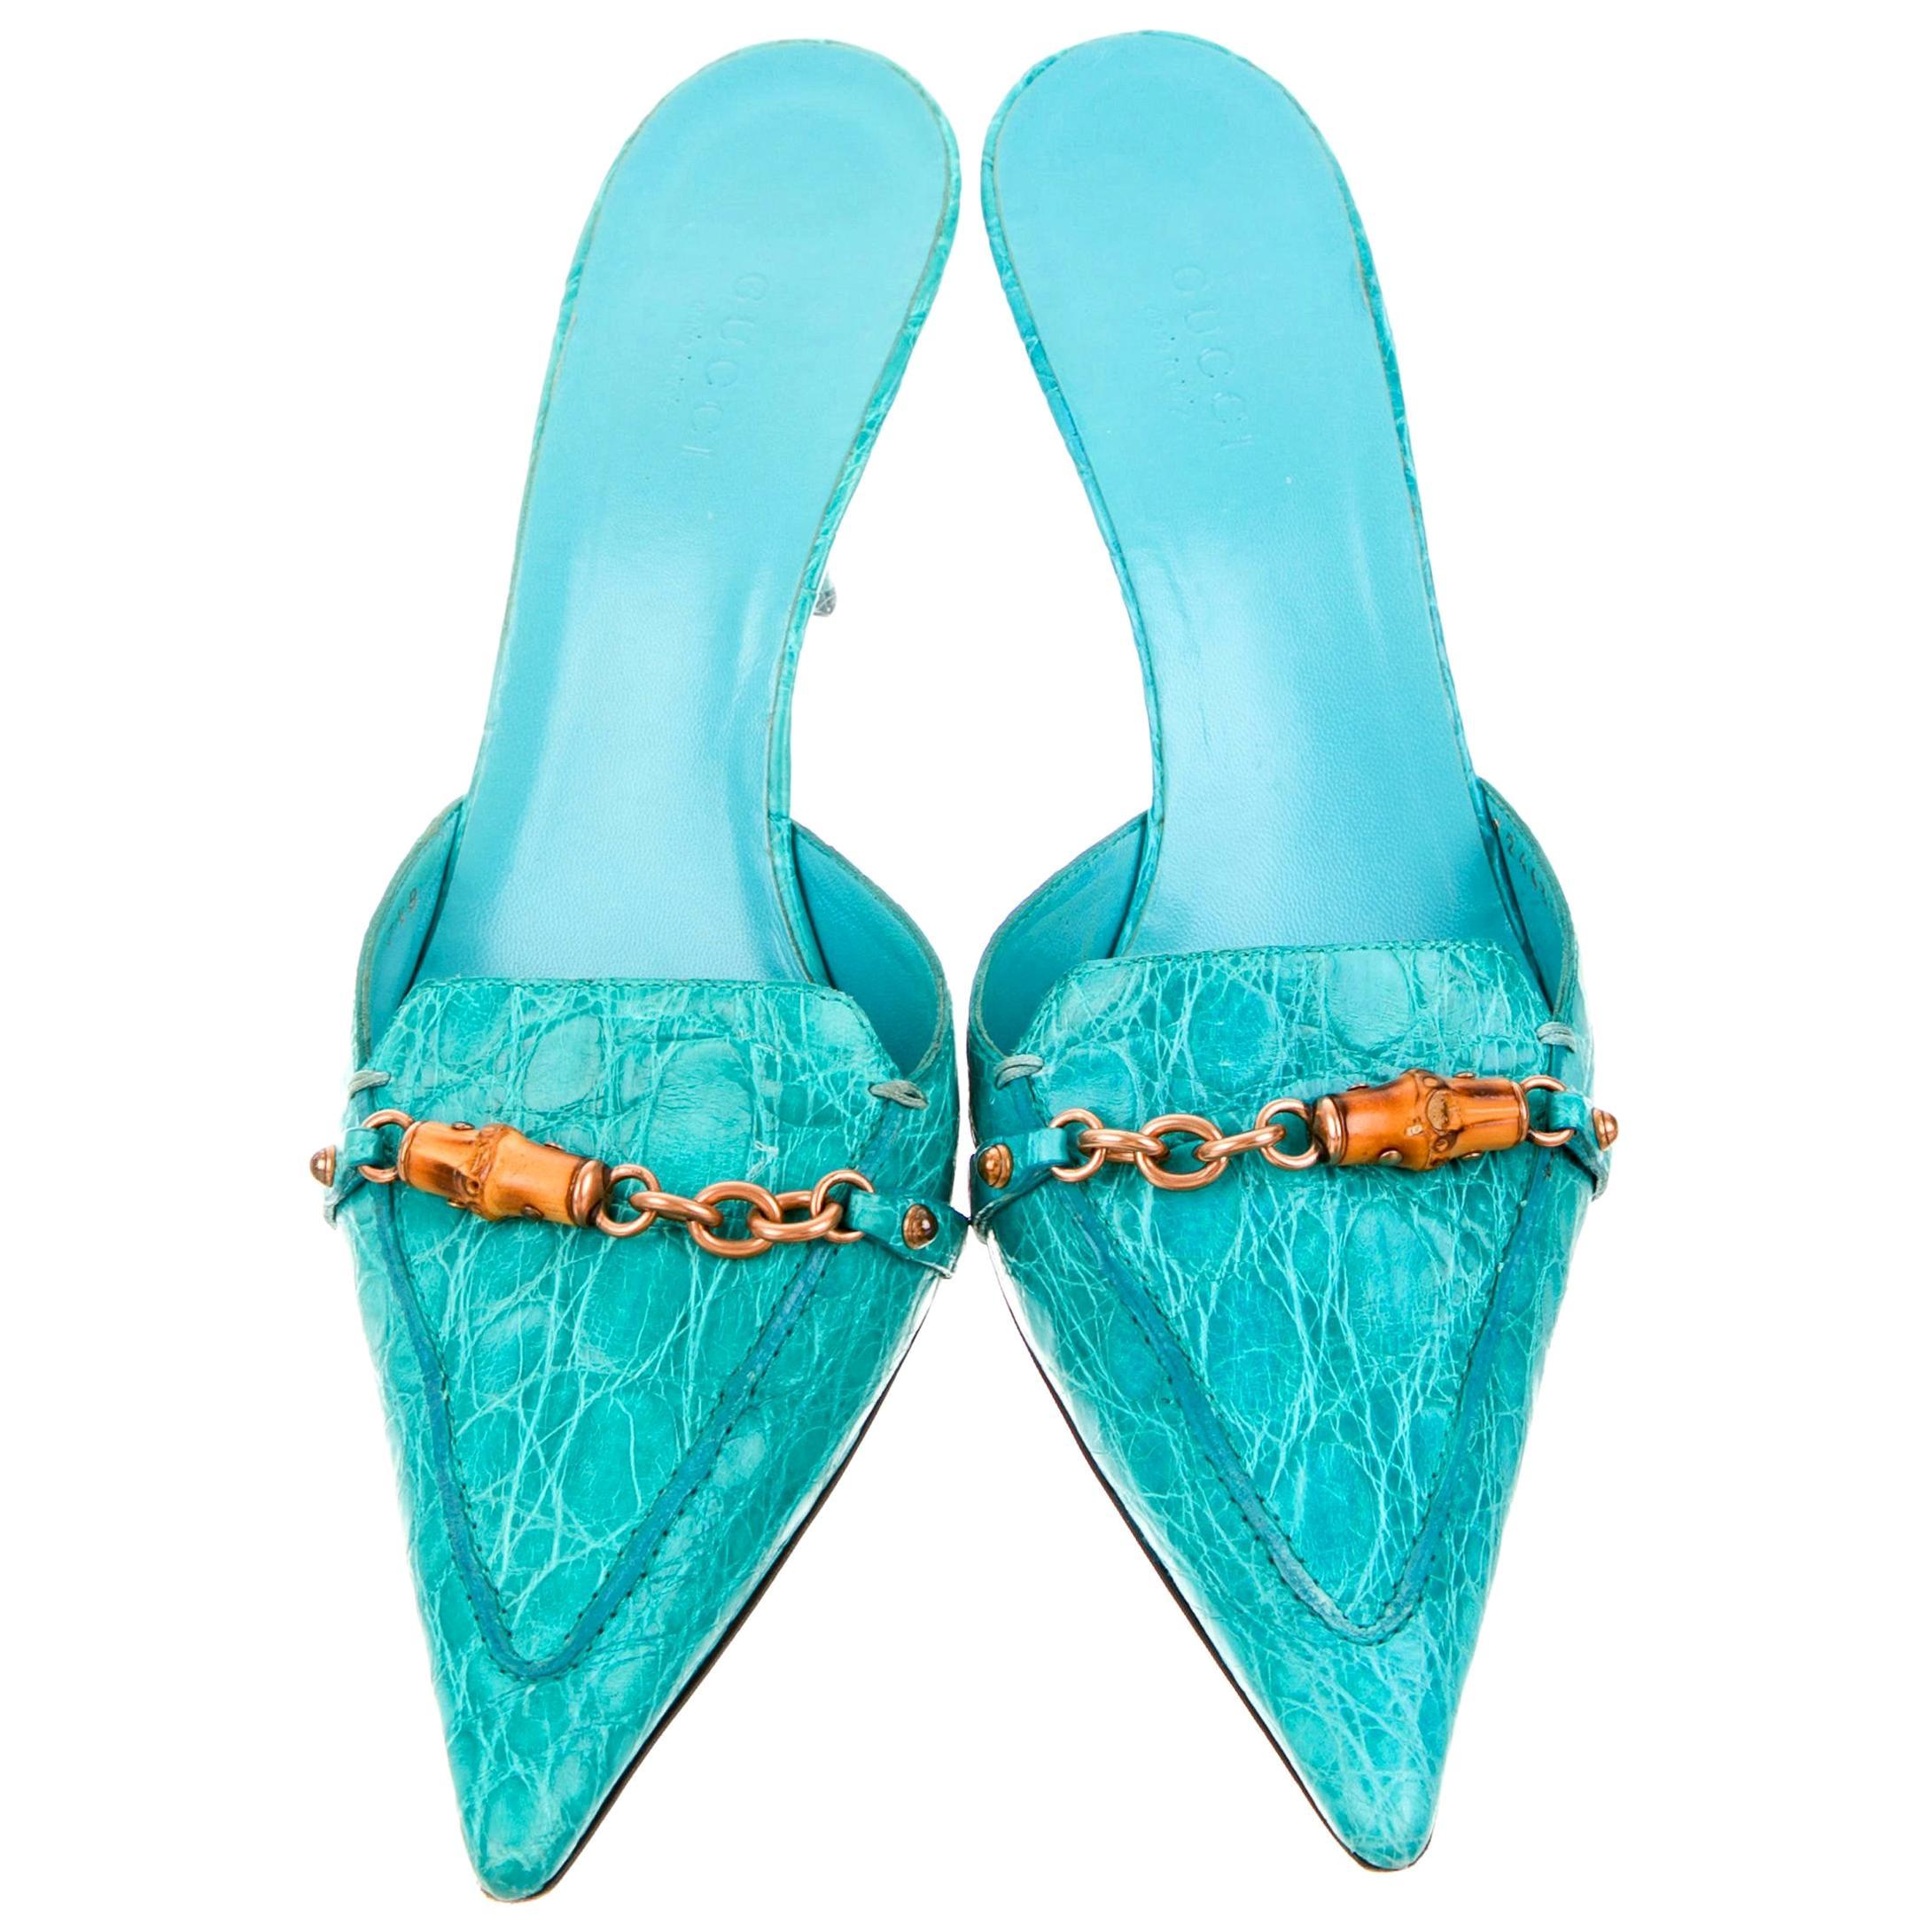 Gucci Exotic Skin Turquoise Aqua Skin Bamboo Chain Mules Kitten Heels Shoes